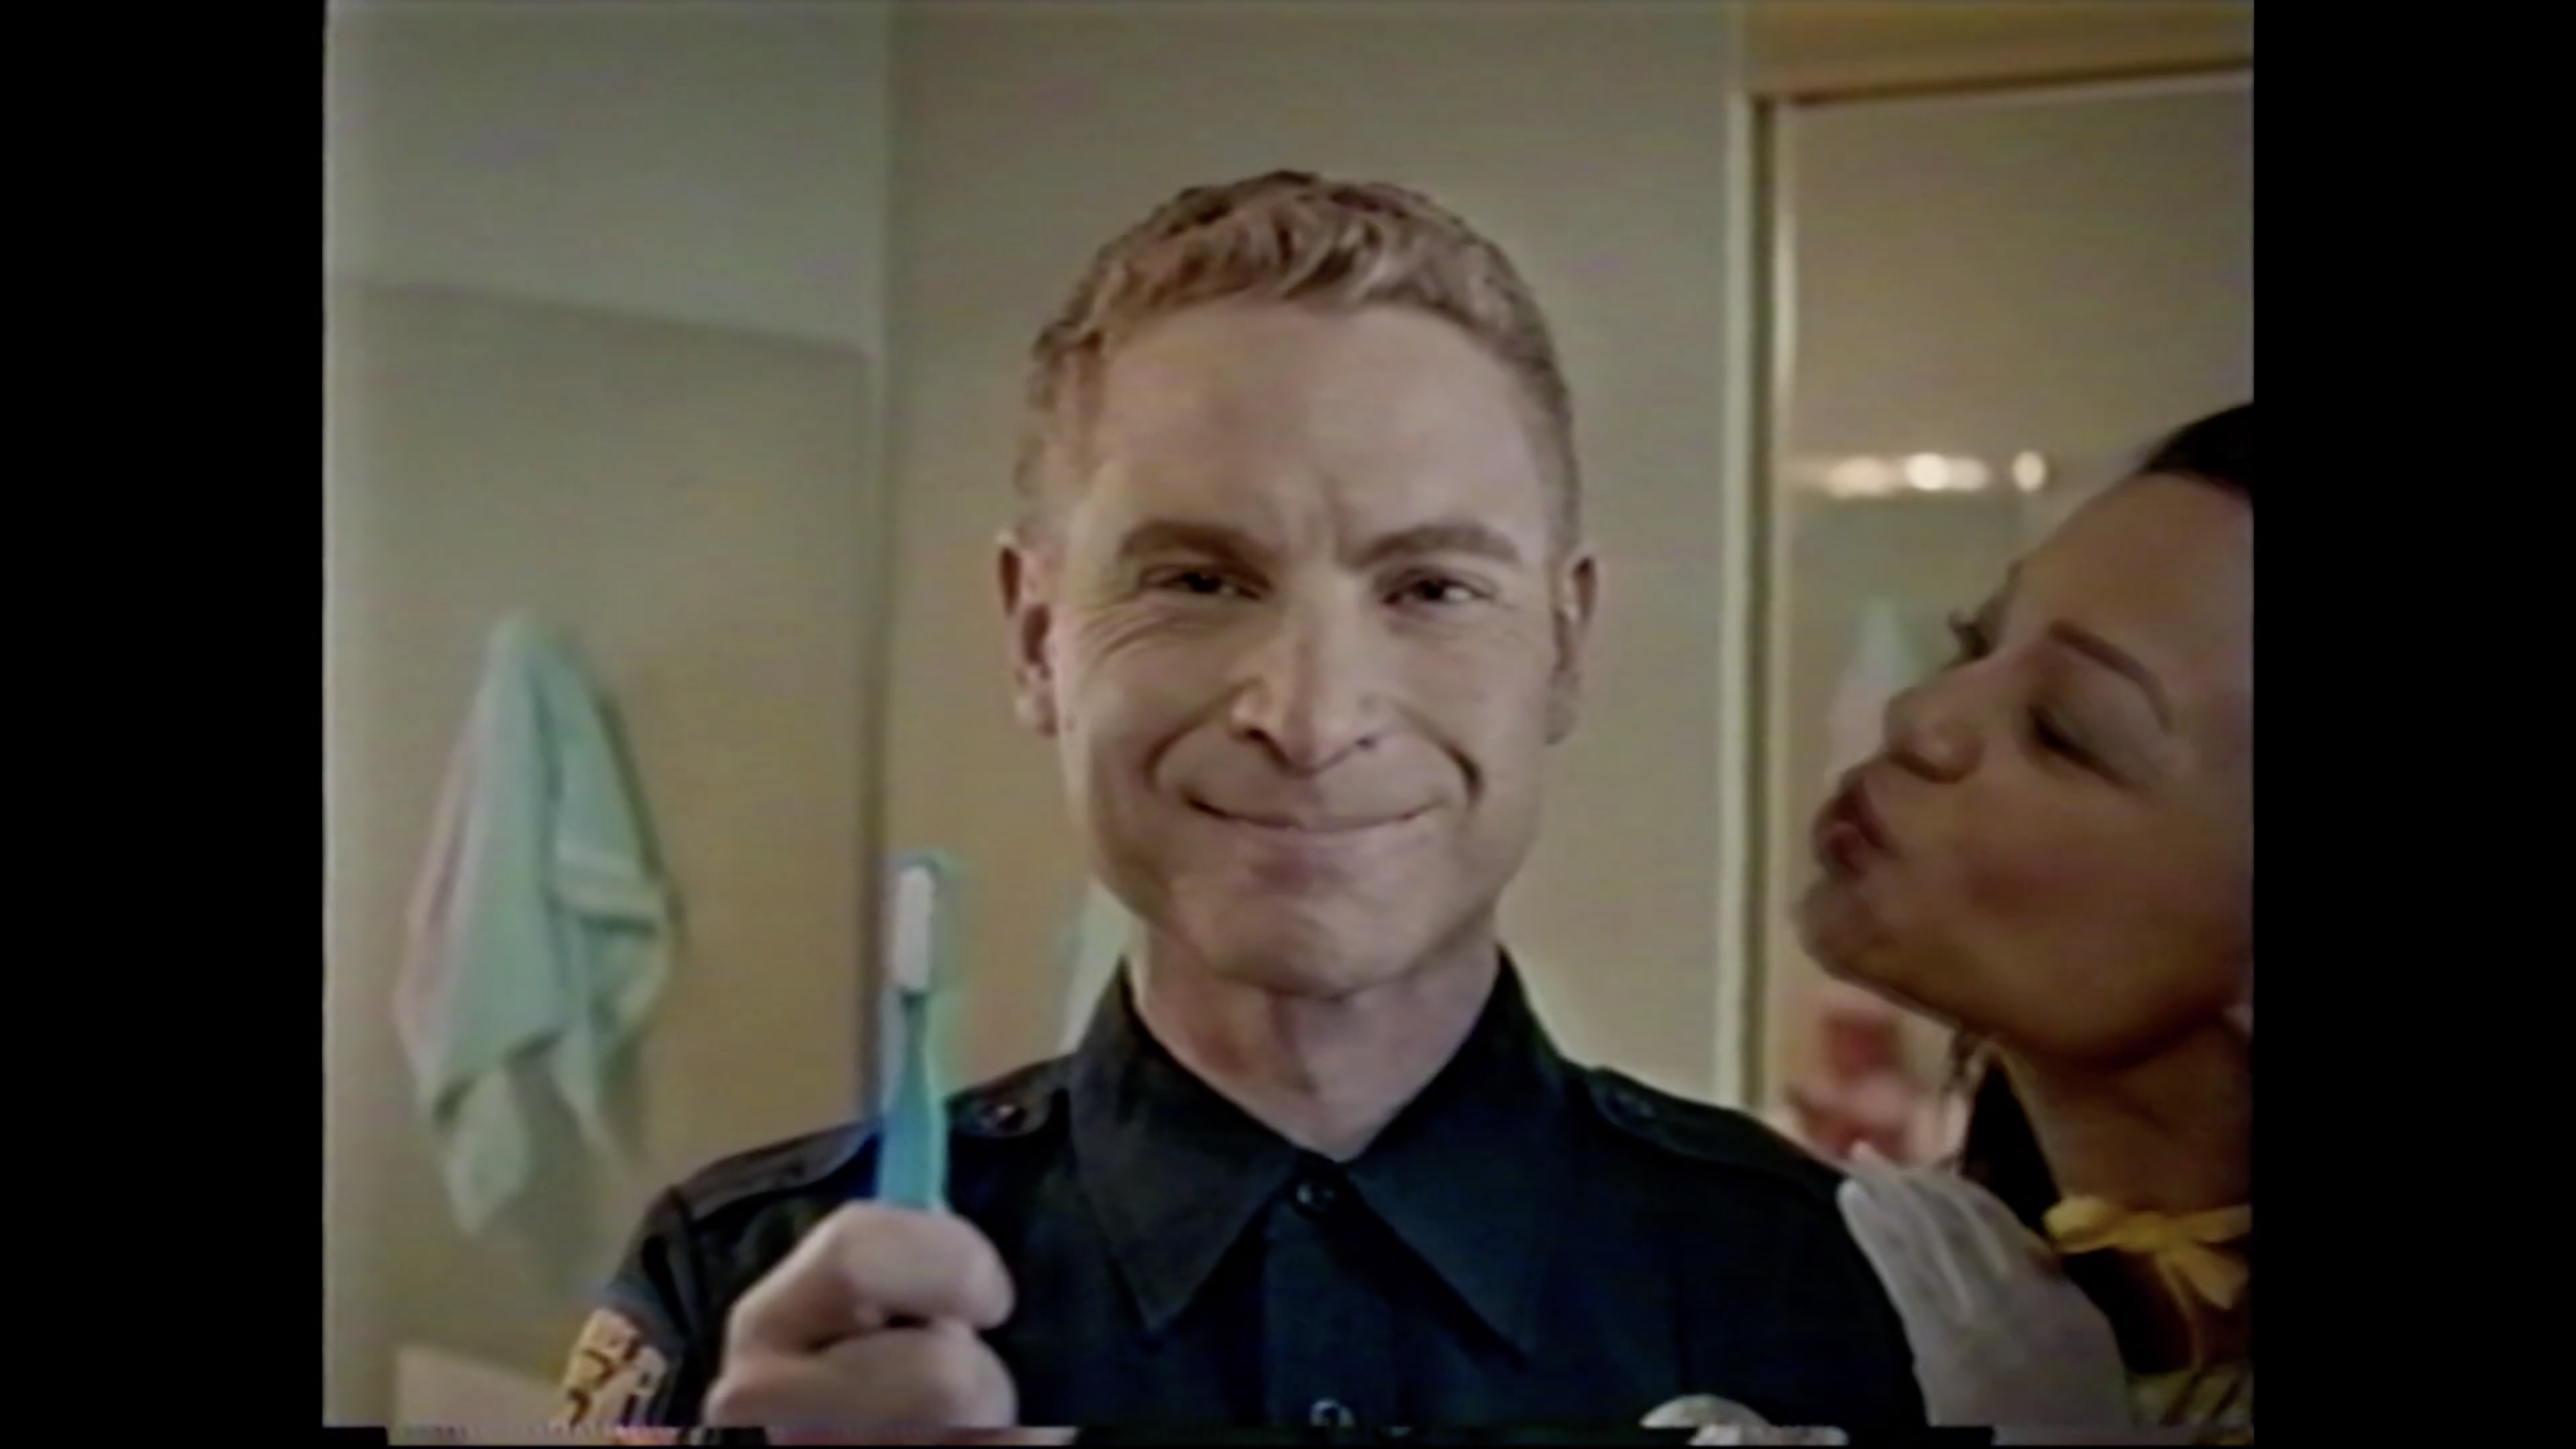 Jim with Toothbrush - Still from Survivial Skills